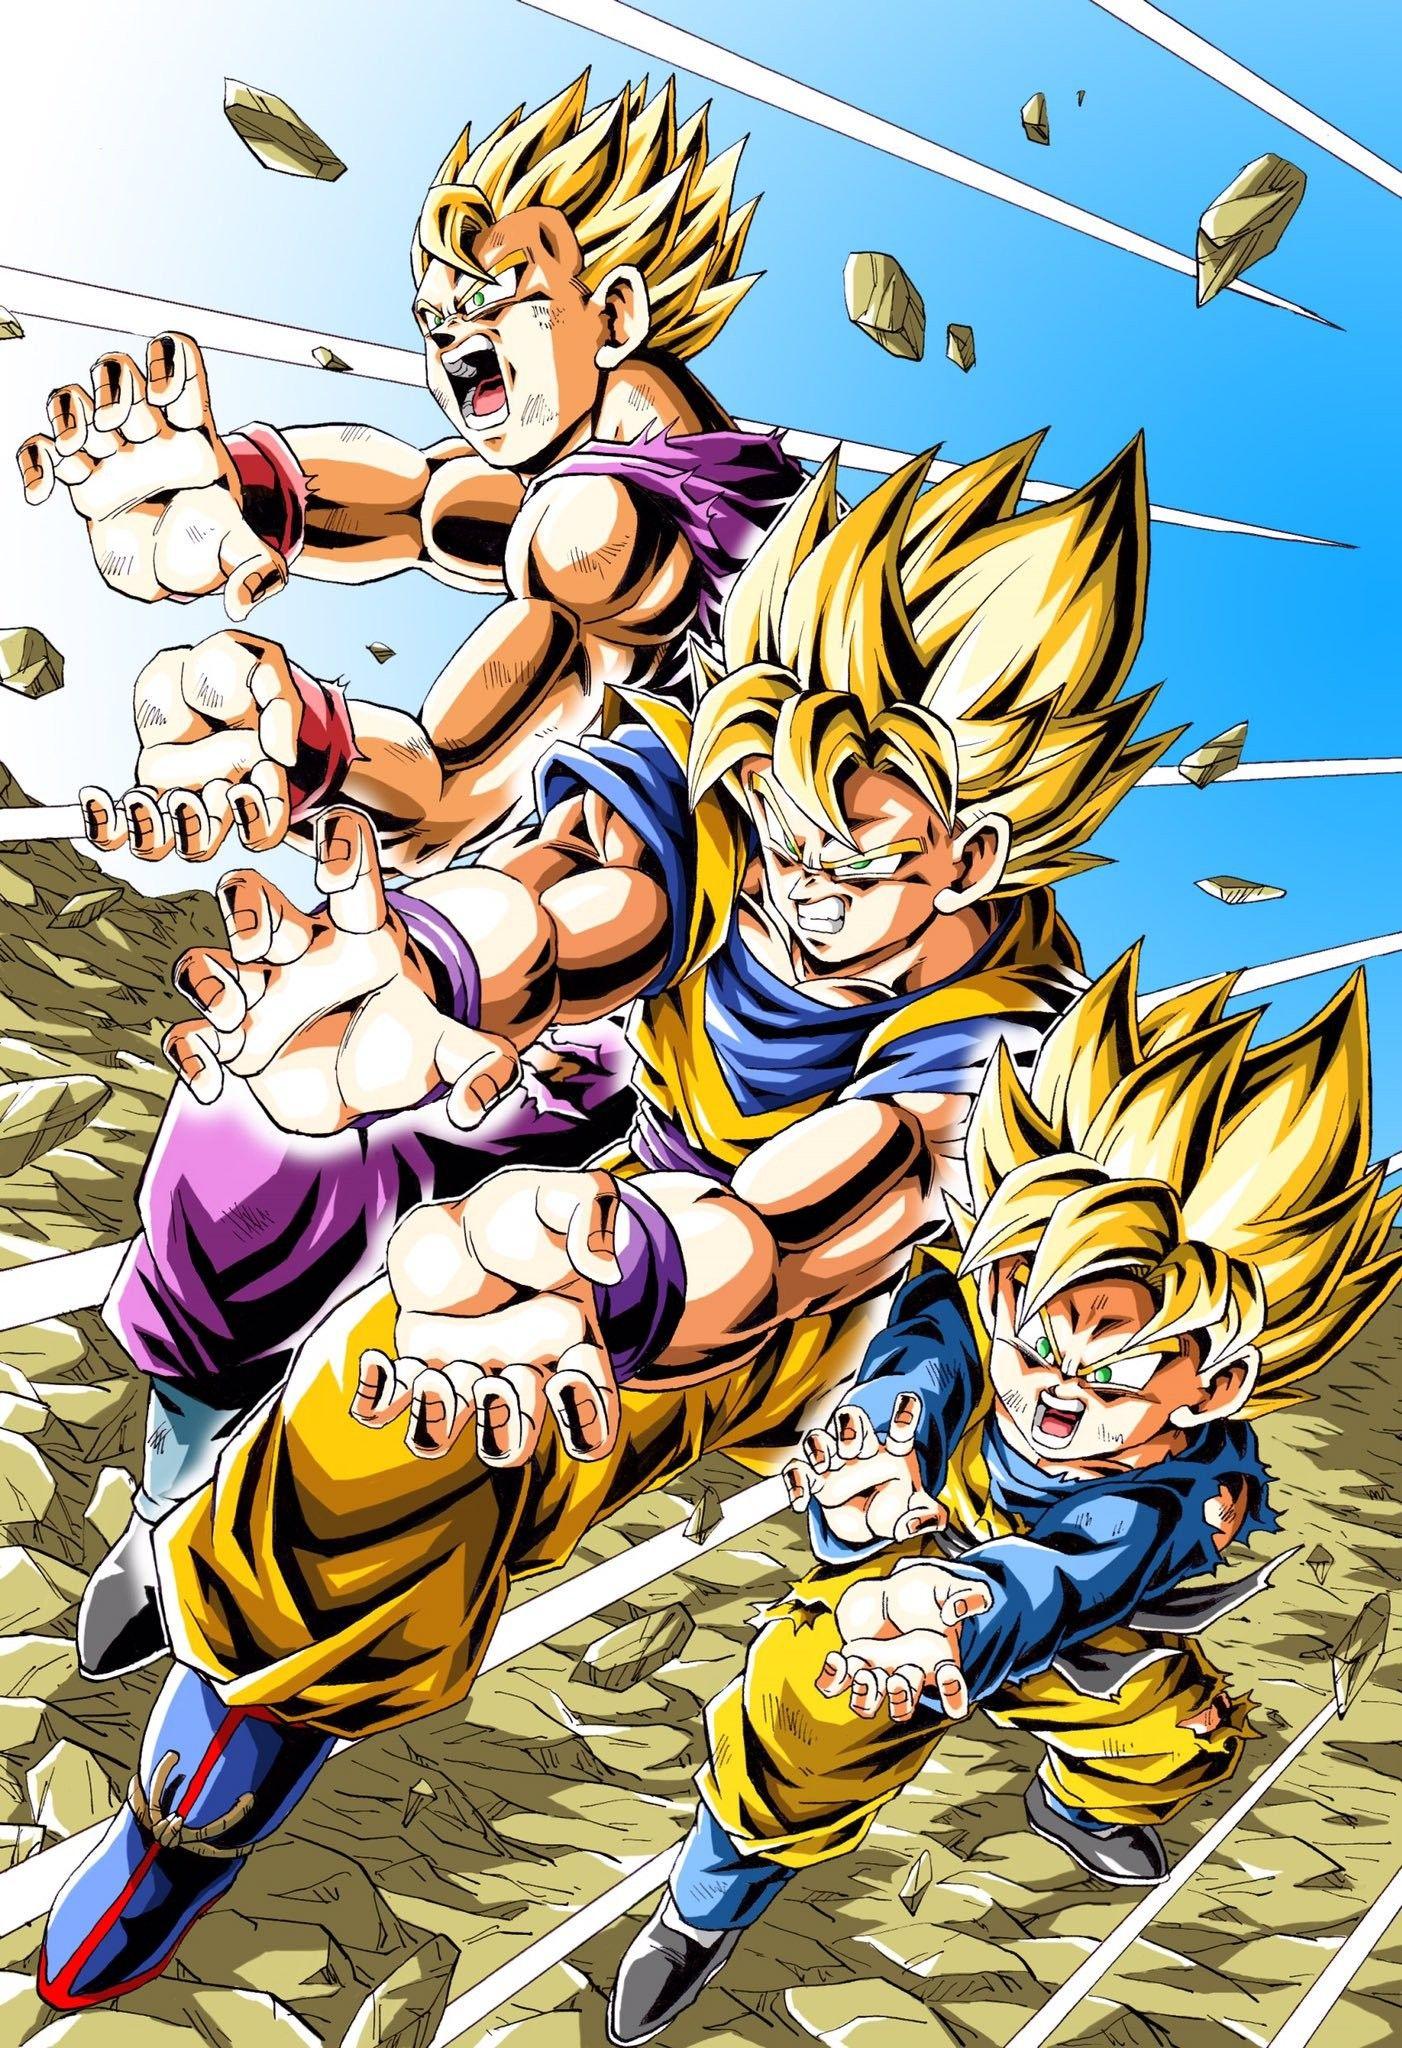 Family Kame Hame Ha Goku Gohan And Goten Ssj1 Anime Dragon Ball Super Dragon Ball Goku Dragon Ball Super Goku